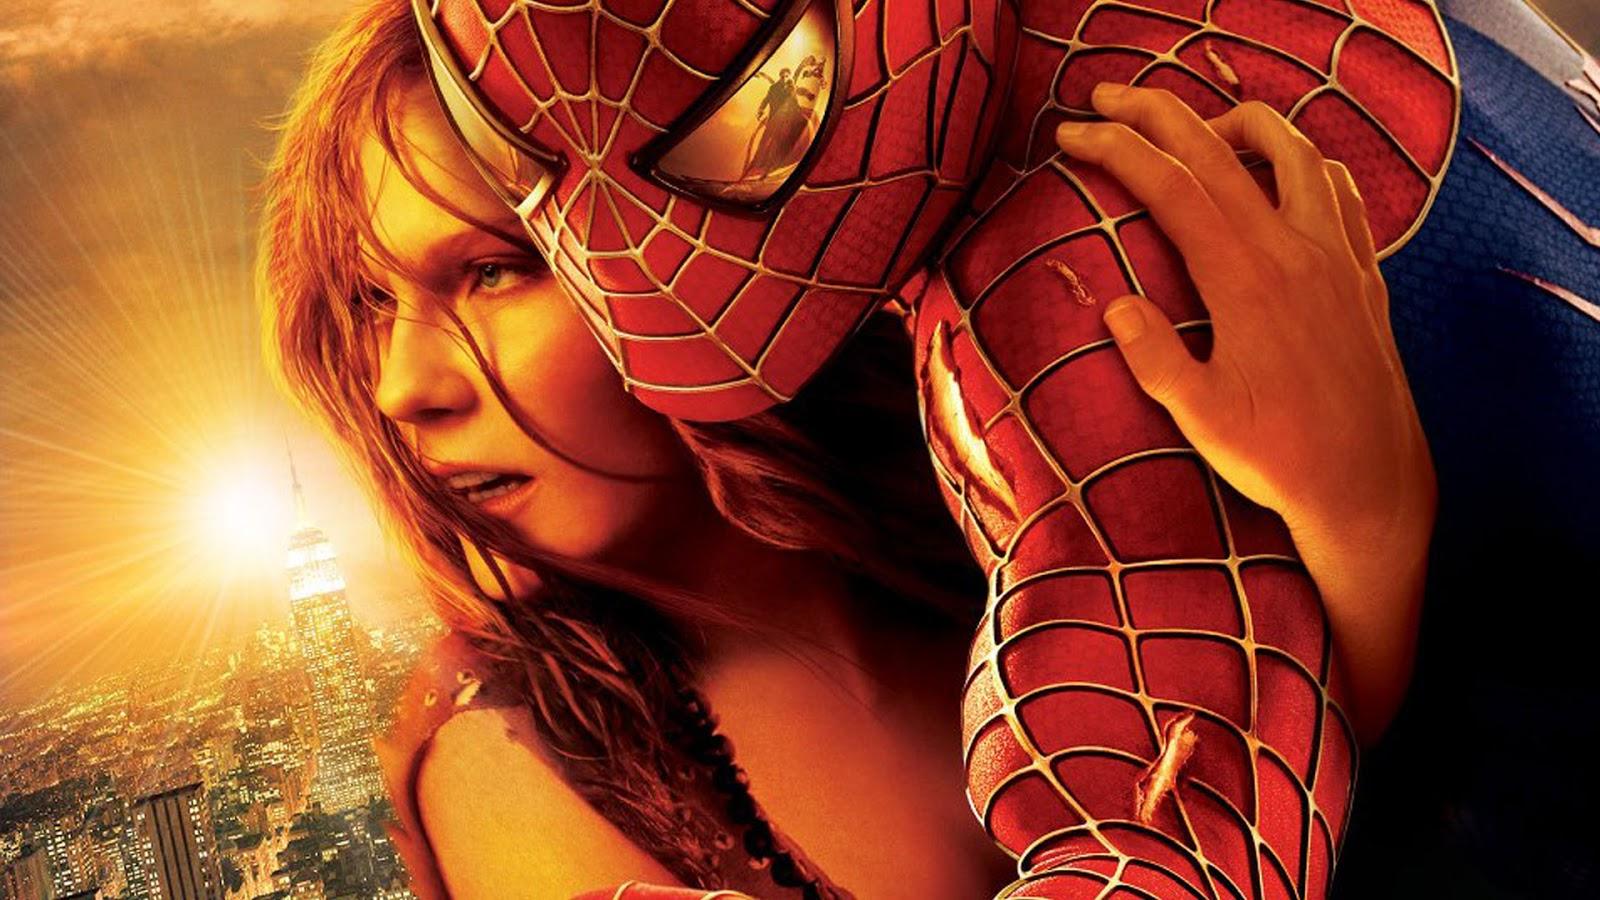 Beautiful Spiderman Wallpaper HD Download